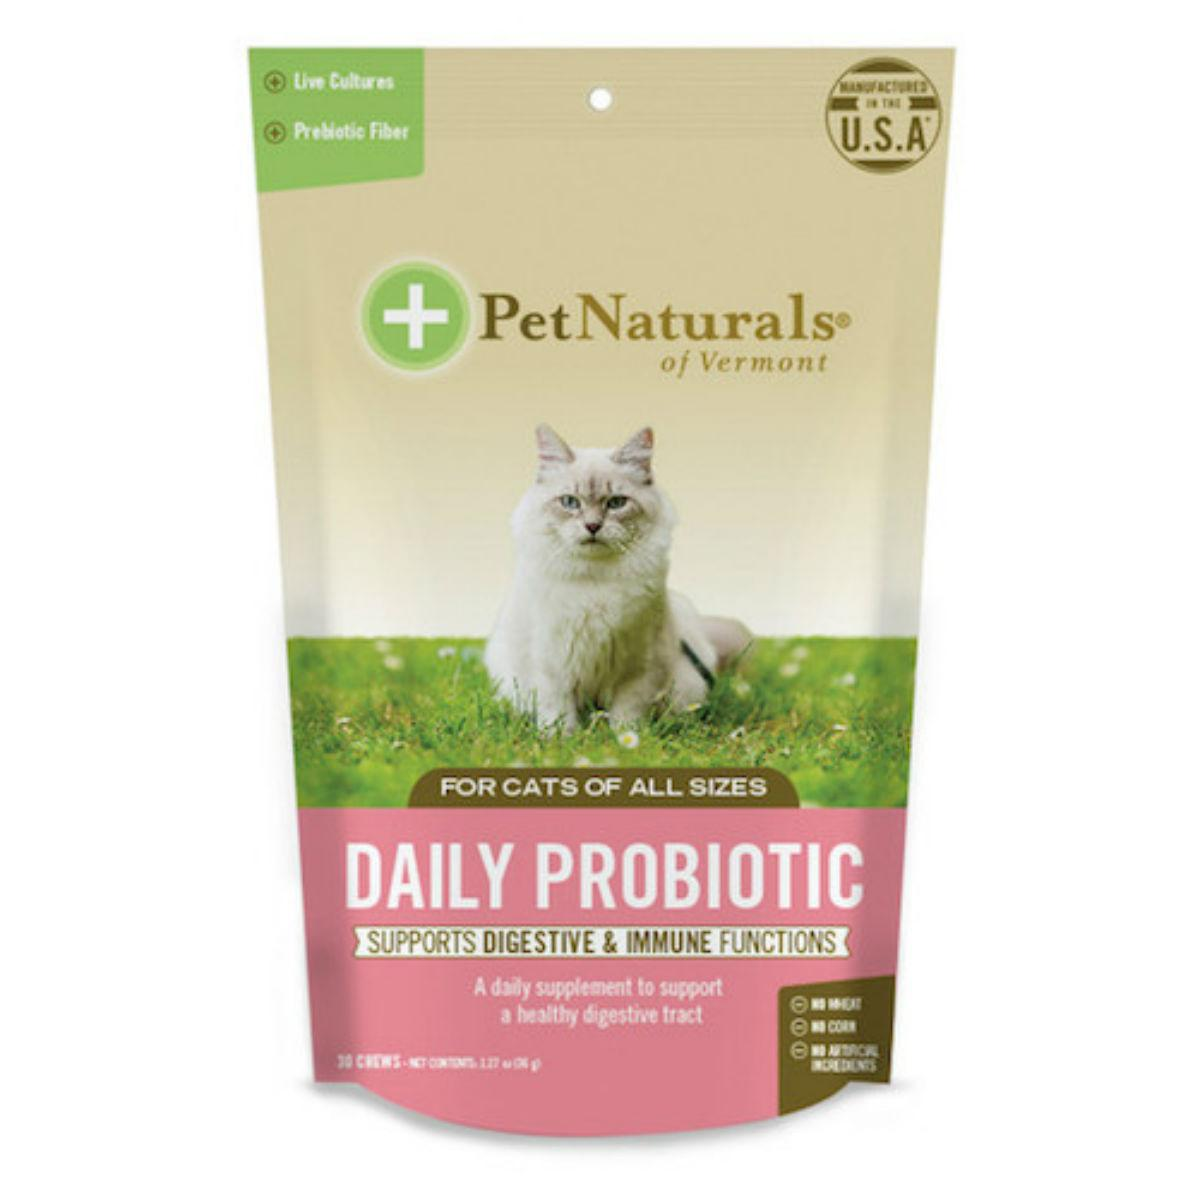 Pet Naturals Daily Probiotic for Cats